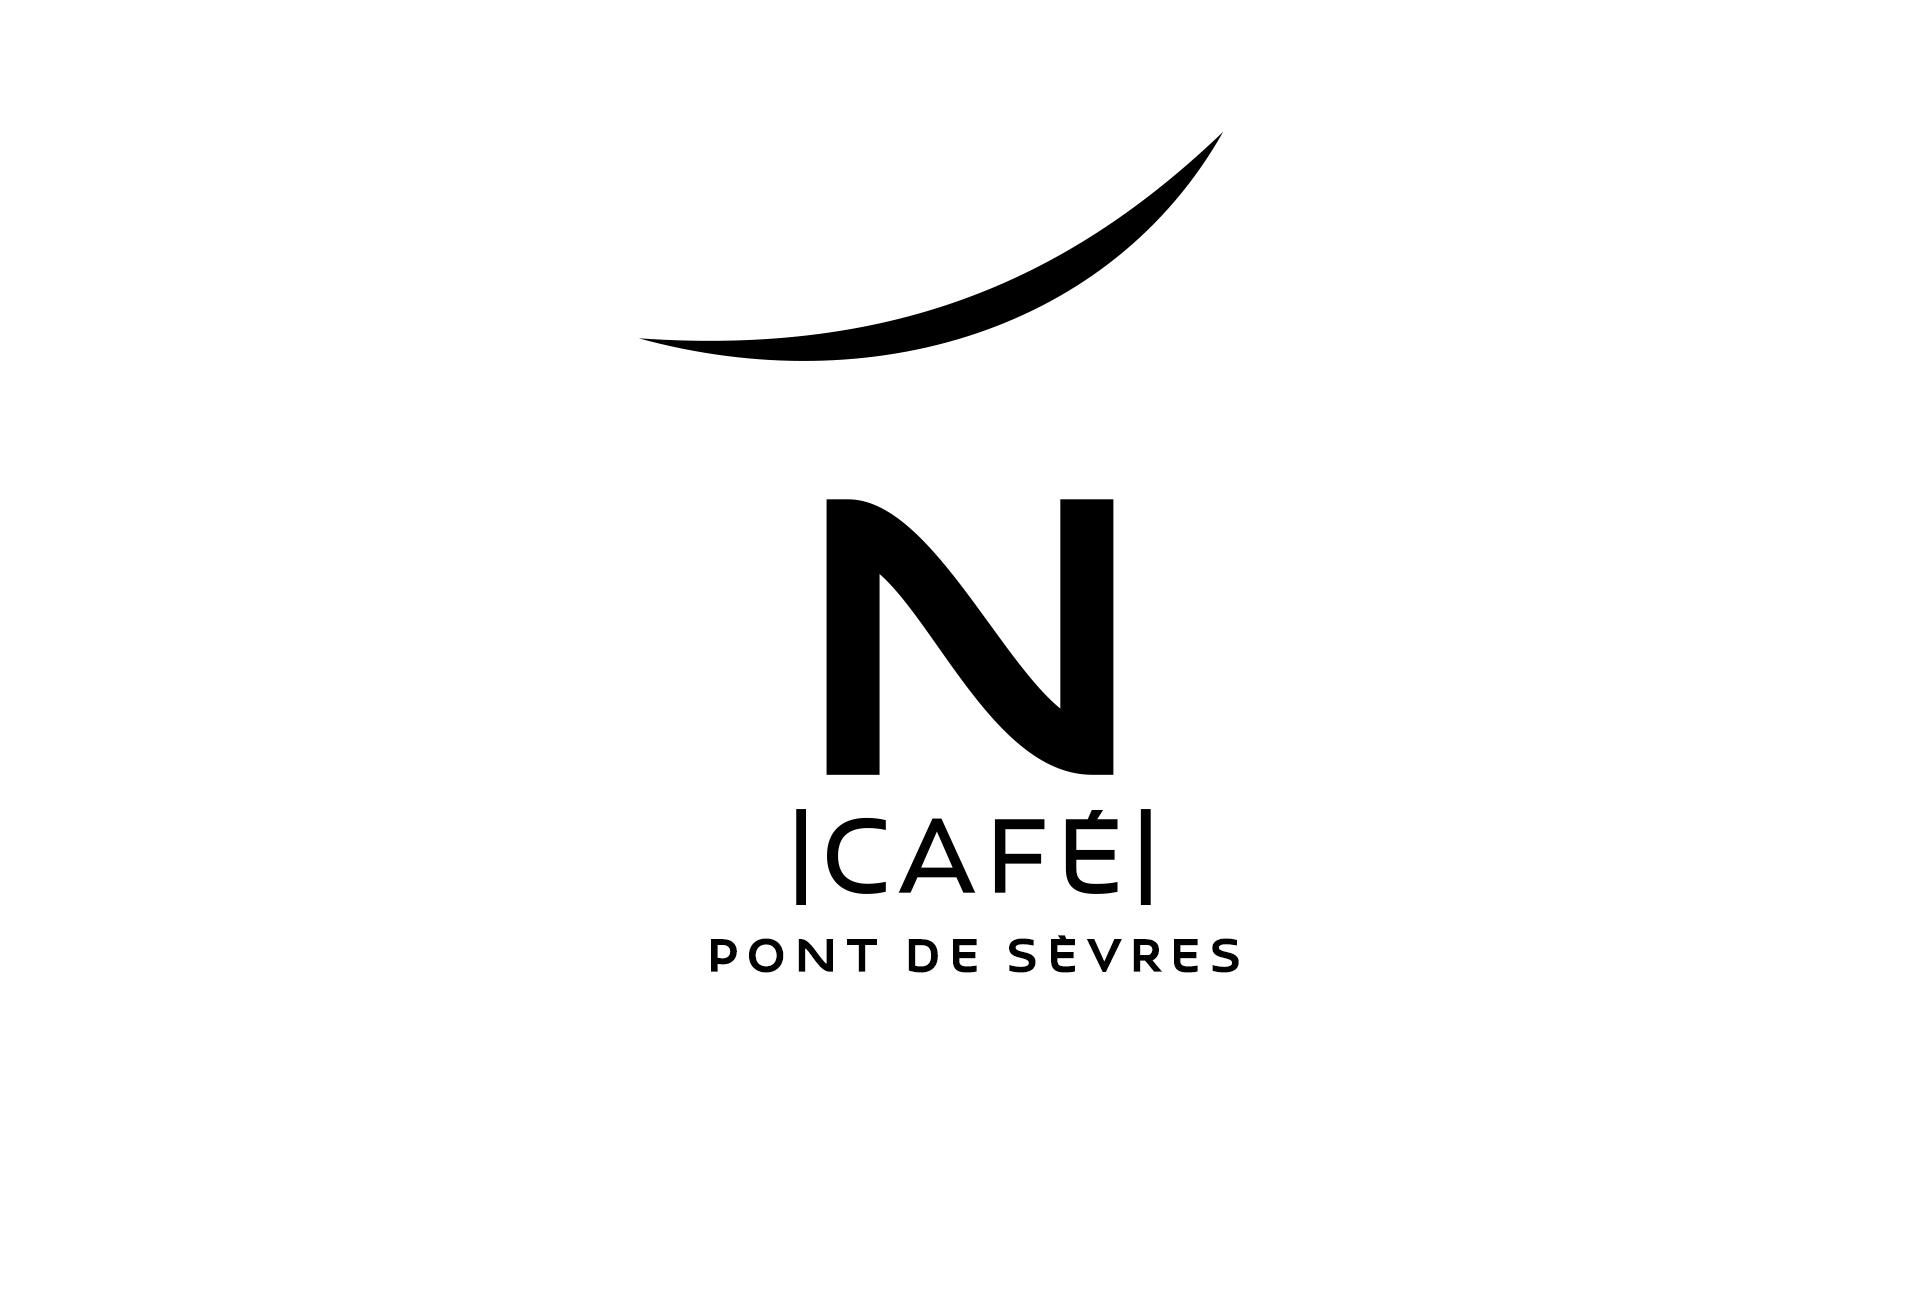 NOVOTEL PONT DE SEVRES